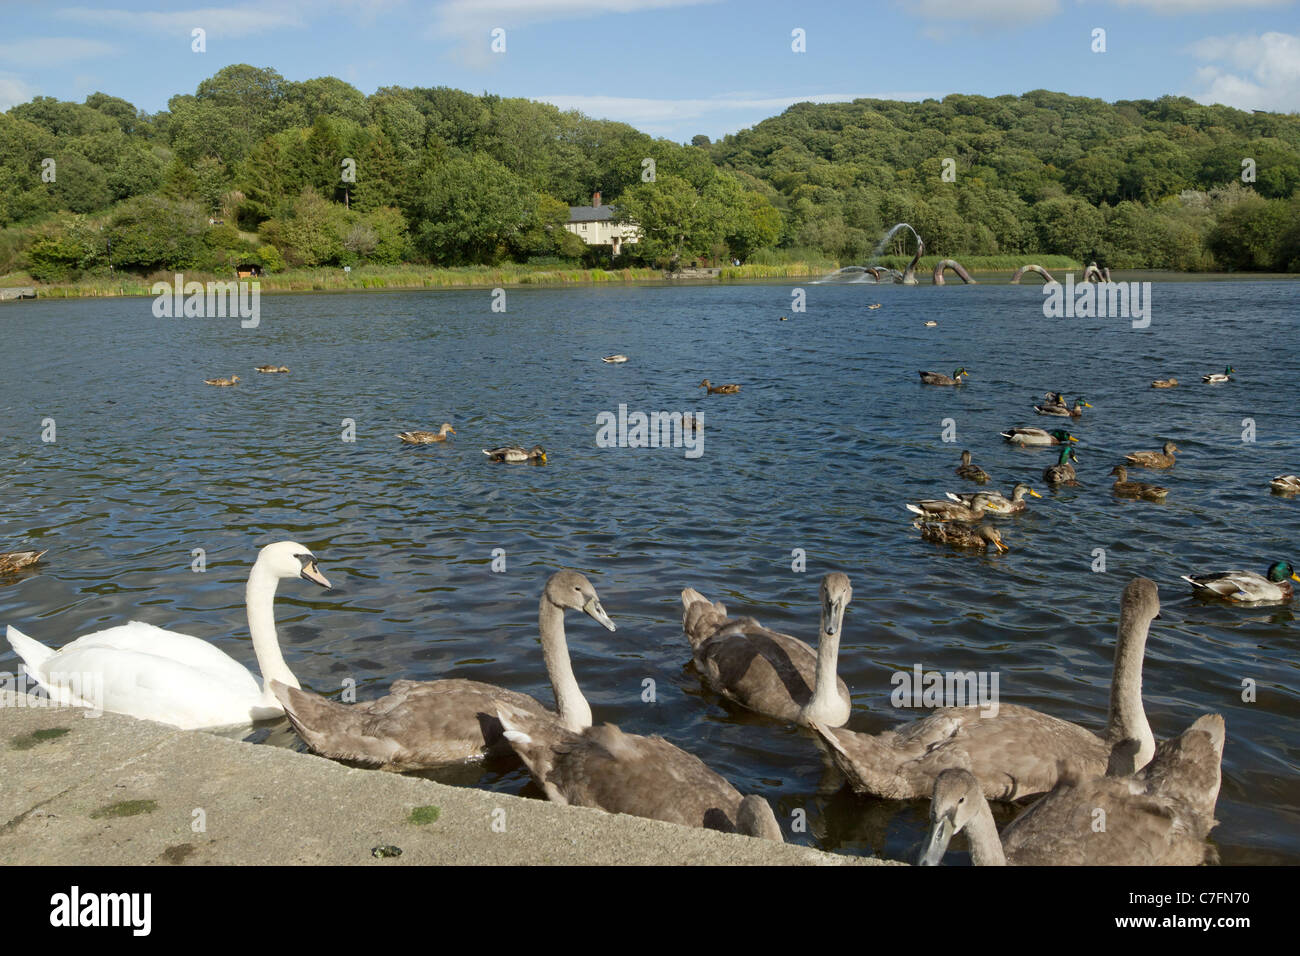 Large cygnets, a swan and ducks on Llandrindod Wells lake, Powys Wales. Stock Photo